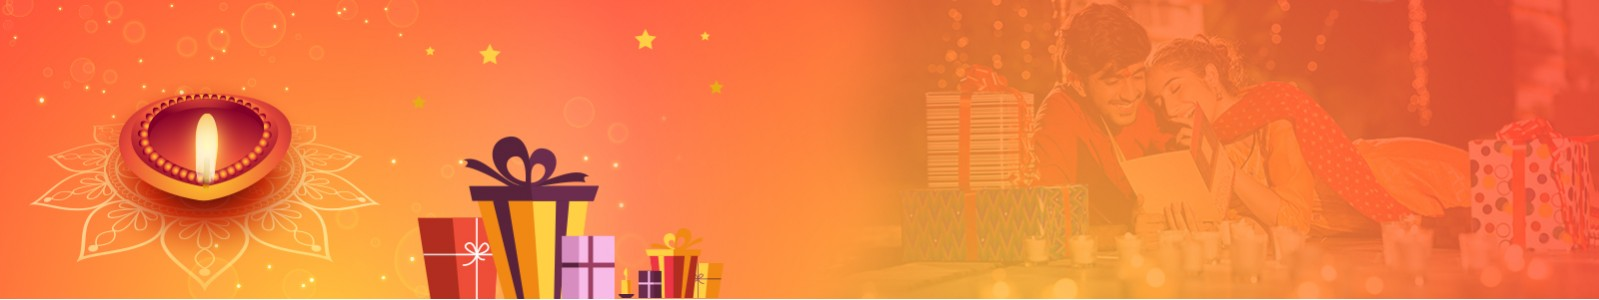 Buy Diwali Gifts For Girlfriend Online